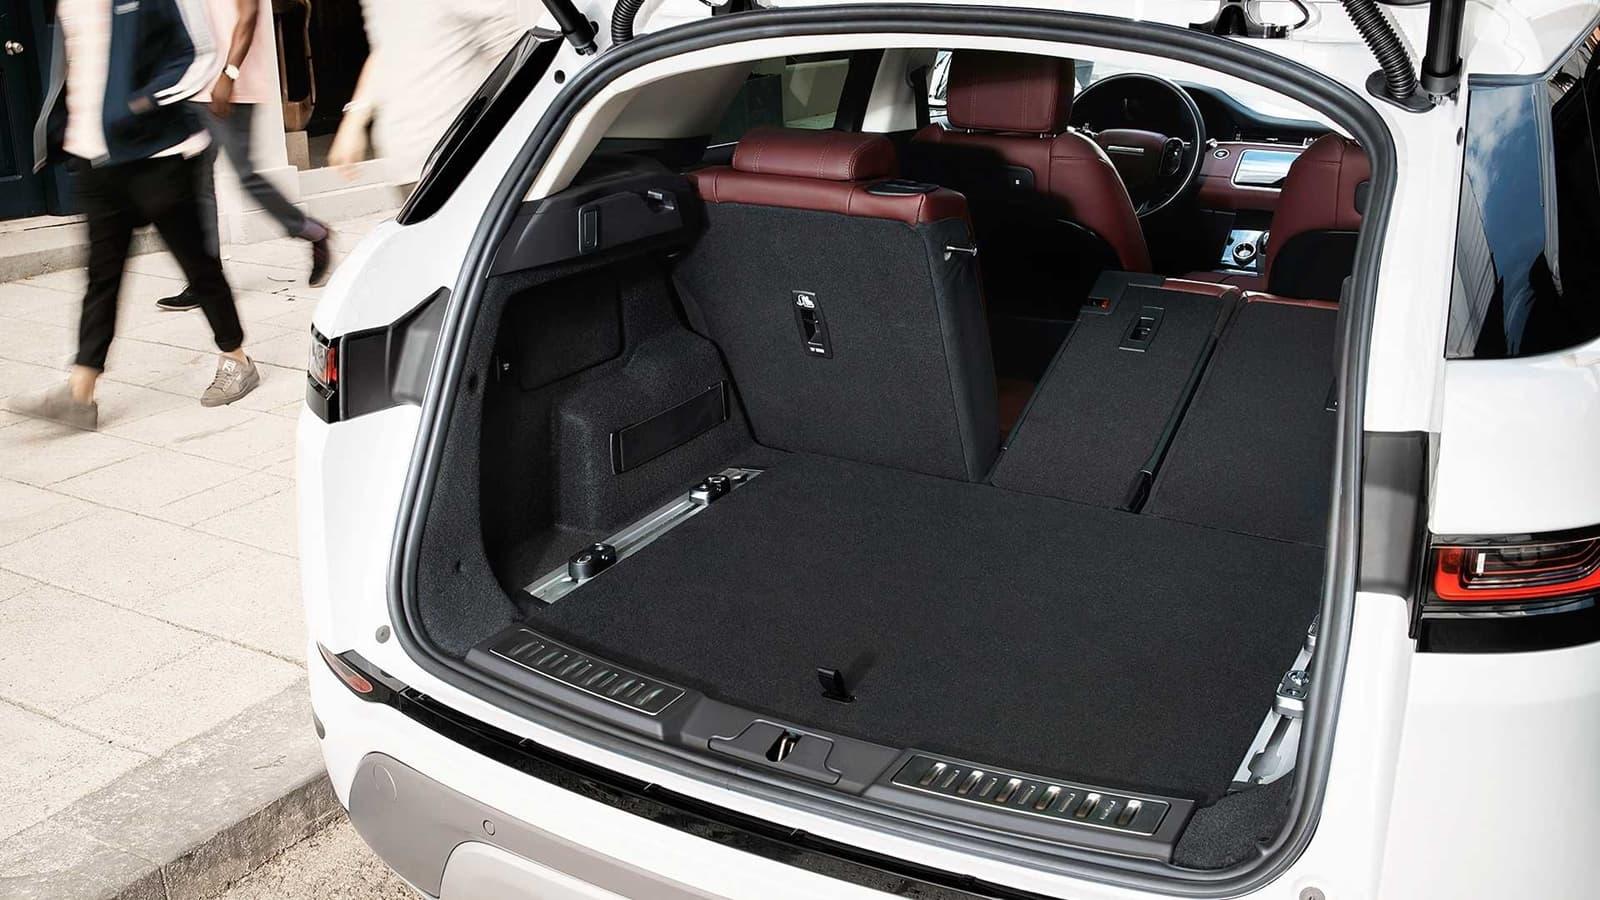 Range Rover Evoque 2019 1118 037